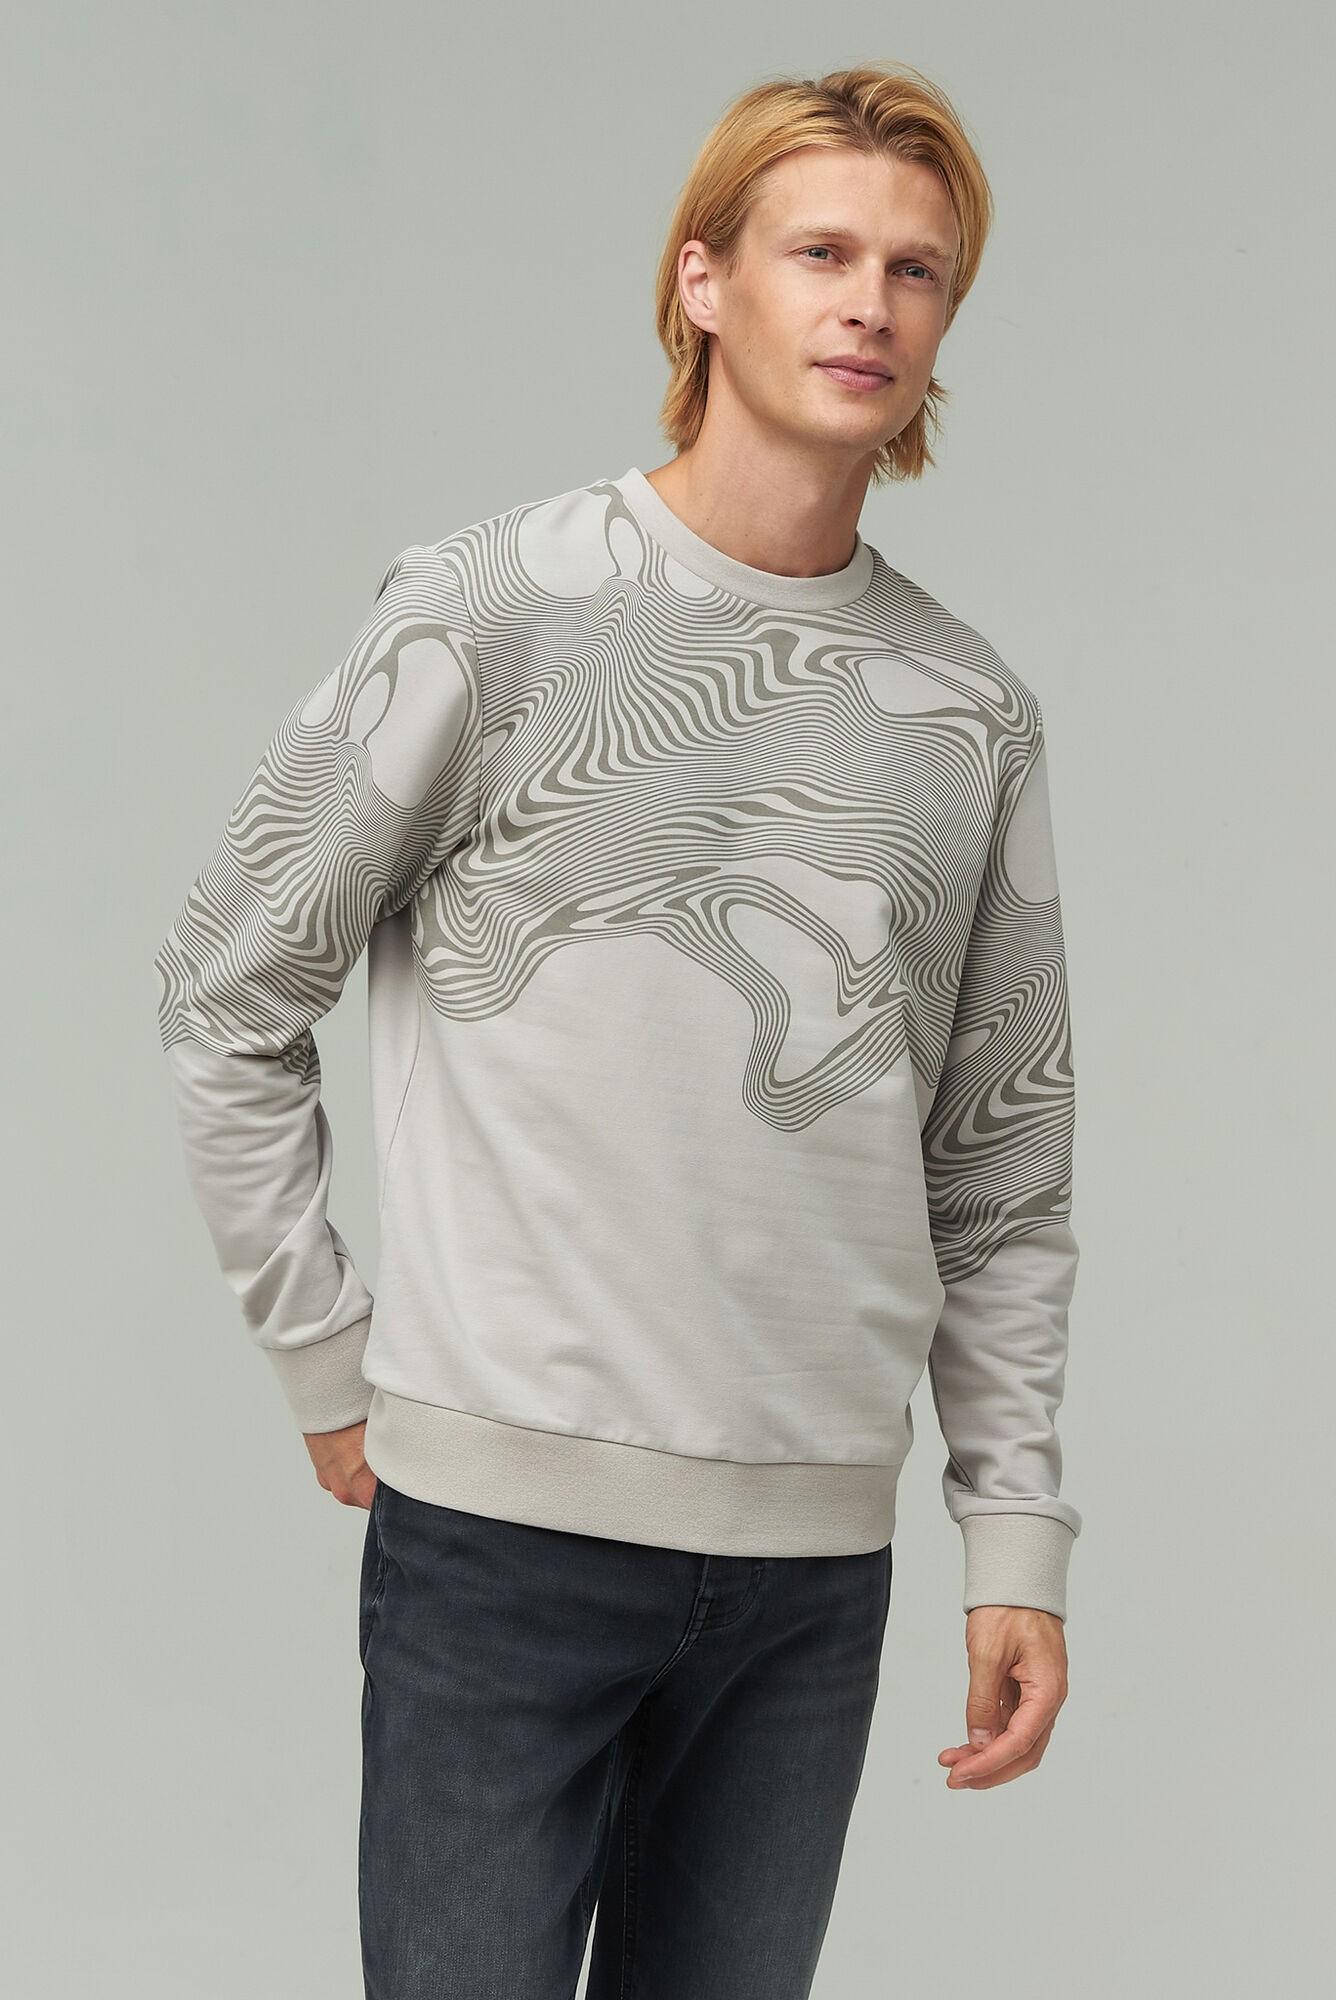 AUDIMAS Tamprus medvilninis džemperis 1921-566 Opal Gray XL